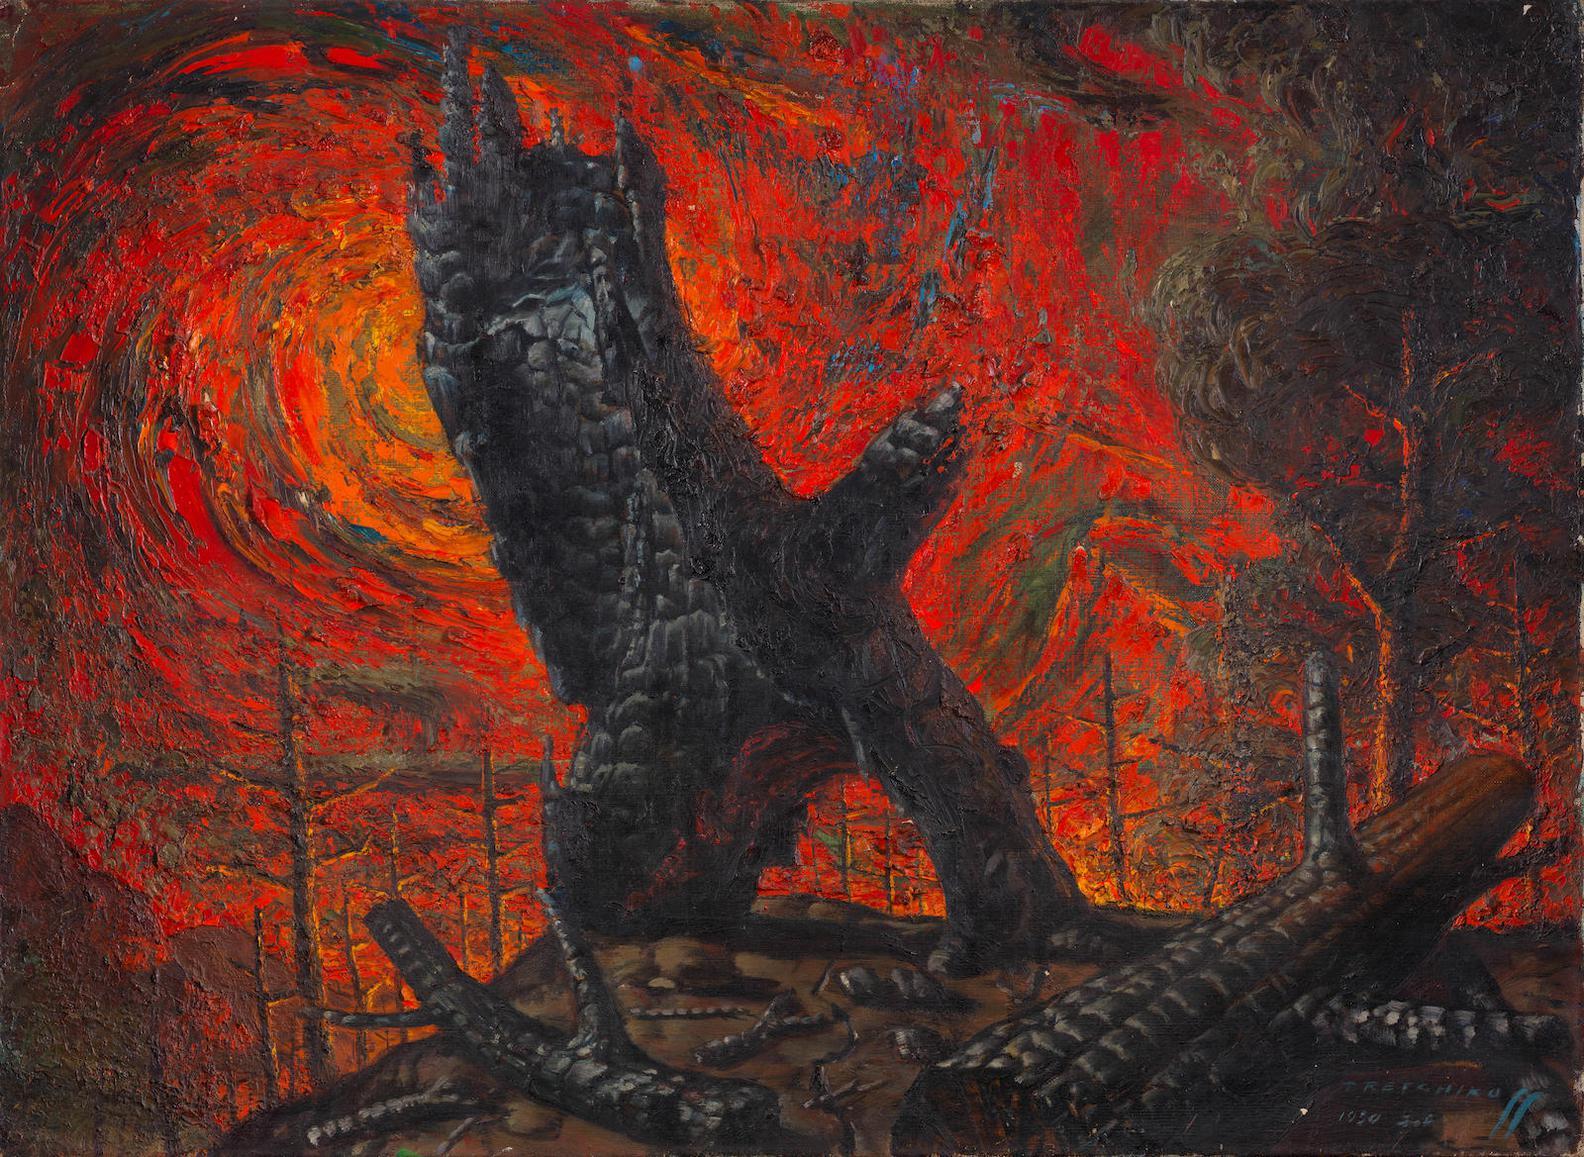 Vladimir Griegorovich Tretchikoff - Mountain Fire-1950